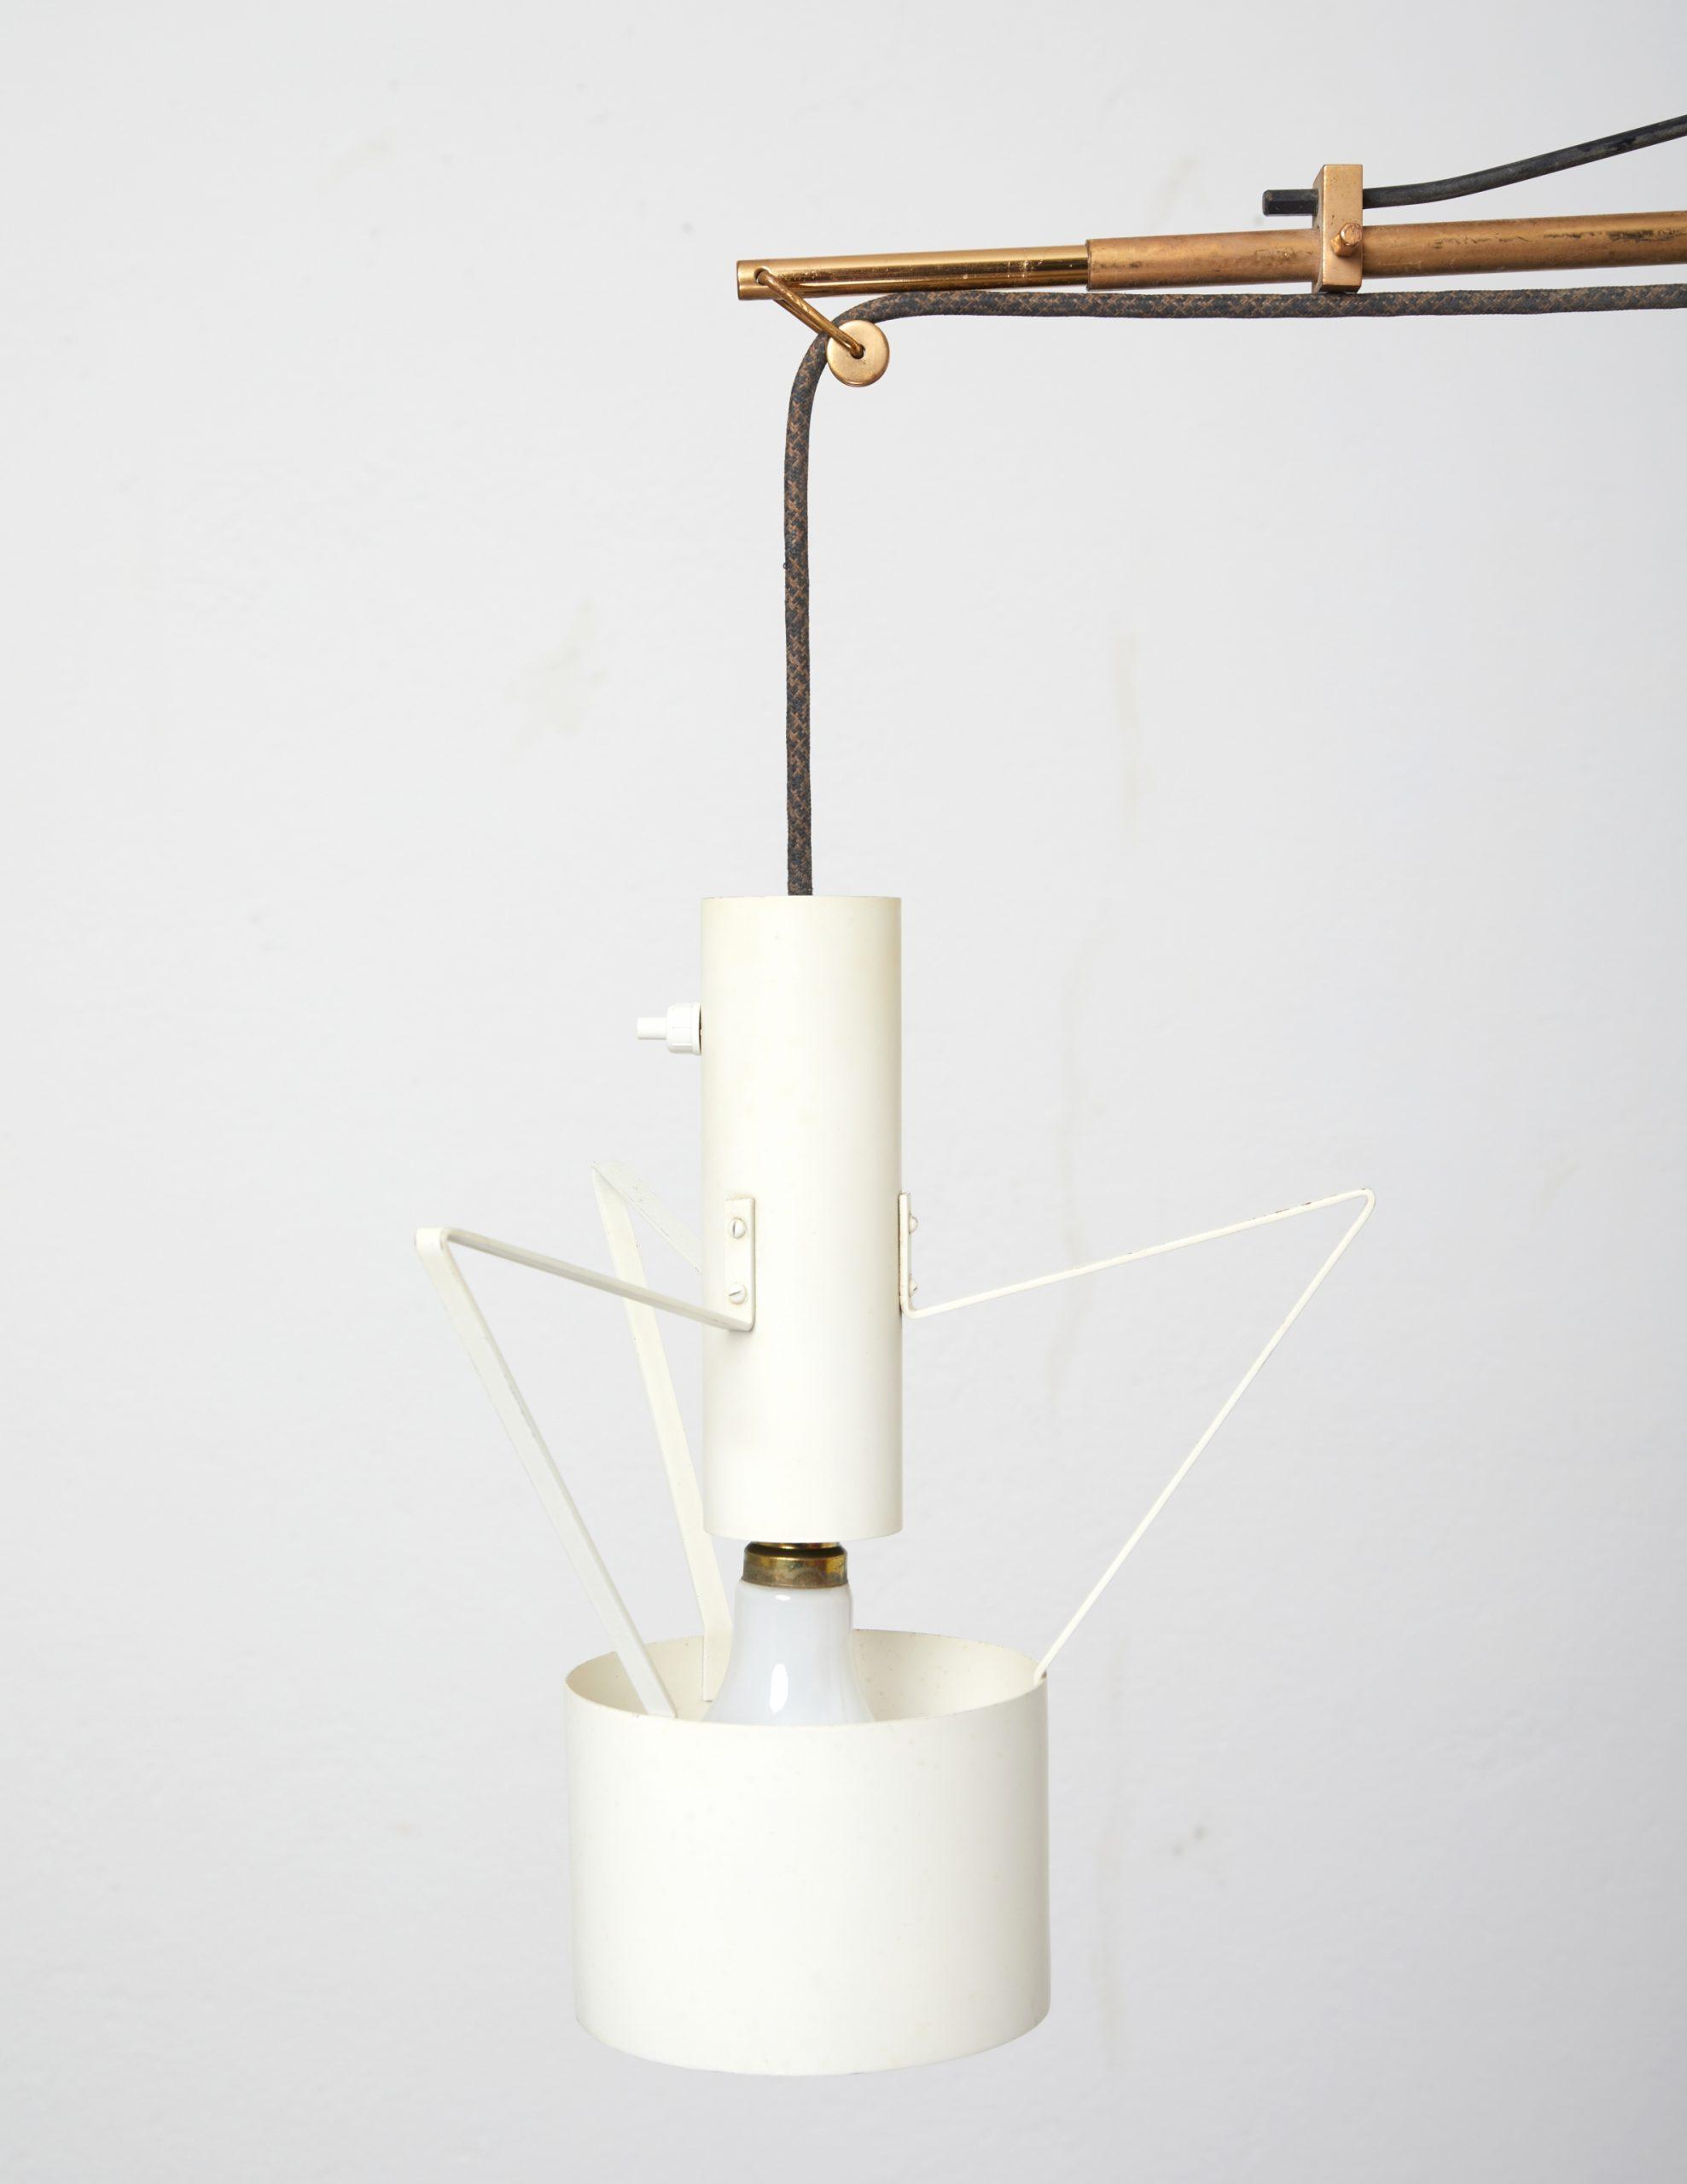 brass-wall-lamp-model-2061-by-gaetano-scolari-for-stilnovo-1954-image-14